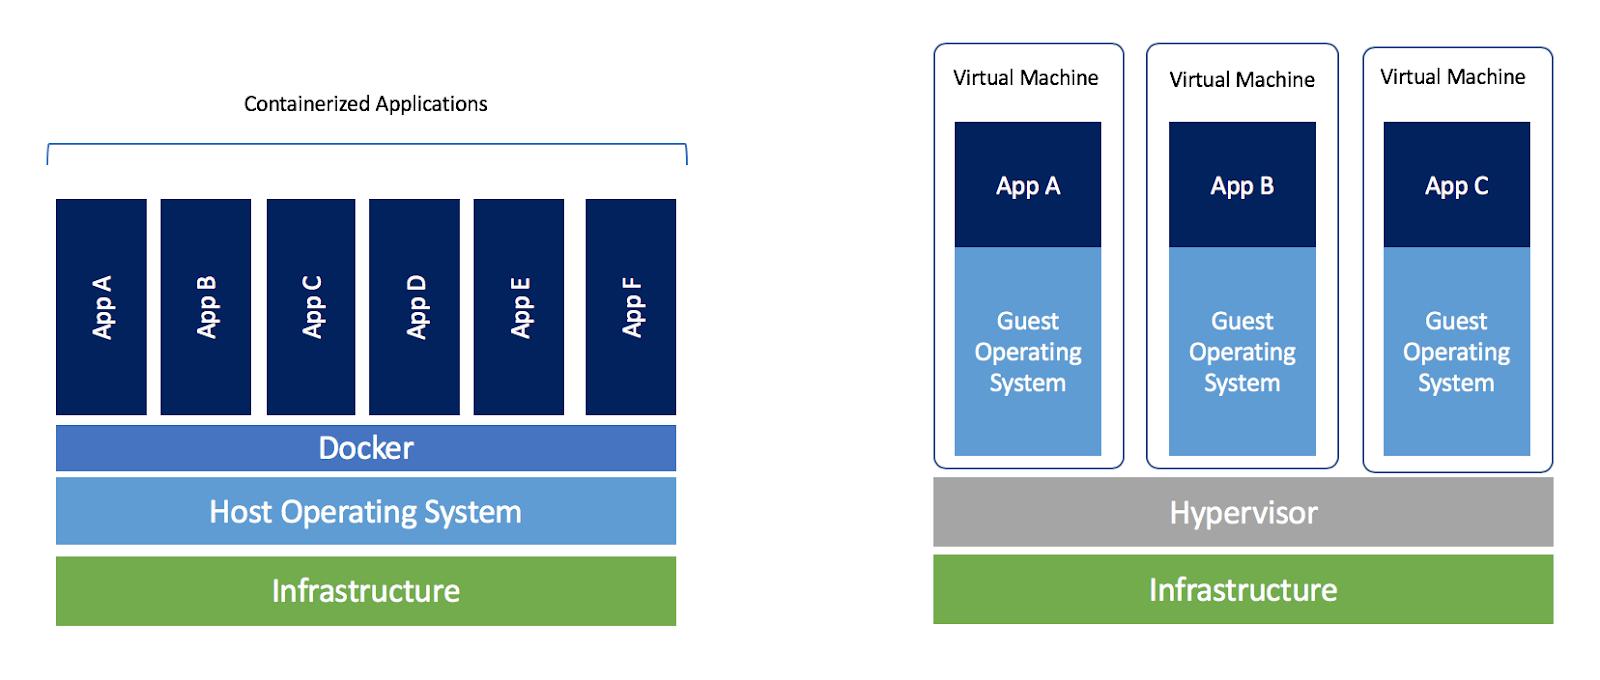 https://i0.wp.com/blog.docker.com/wp-content/uploads/Blog.-Are-containers-..VM-Image-1.png?fit=1600%2C680&ssl=1